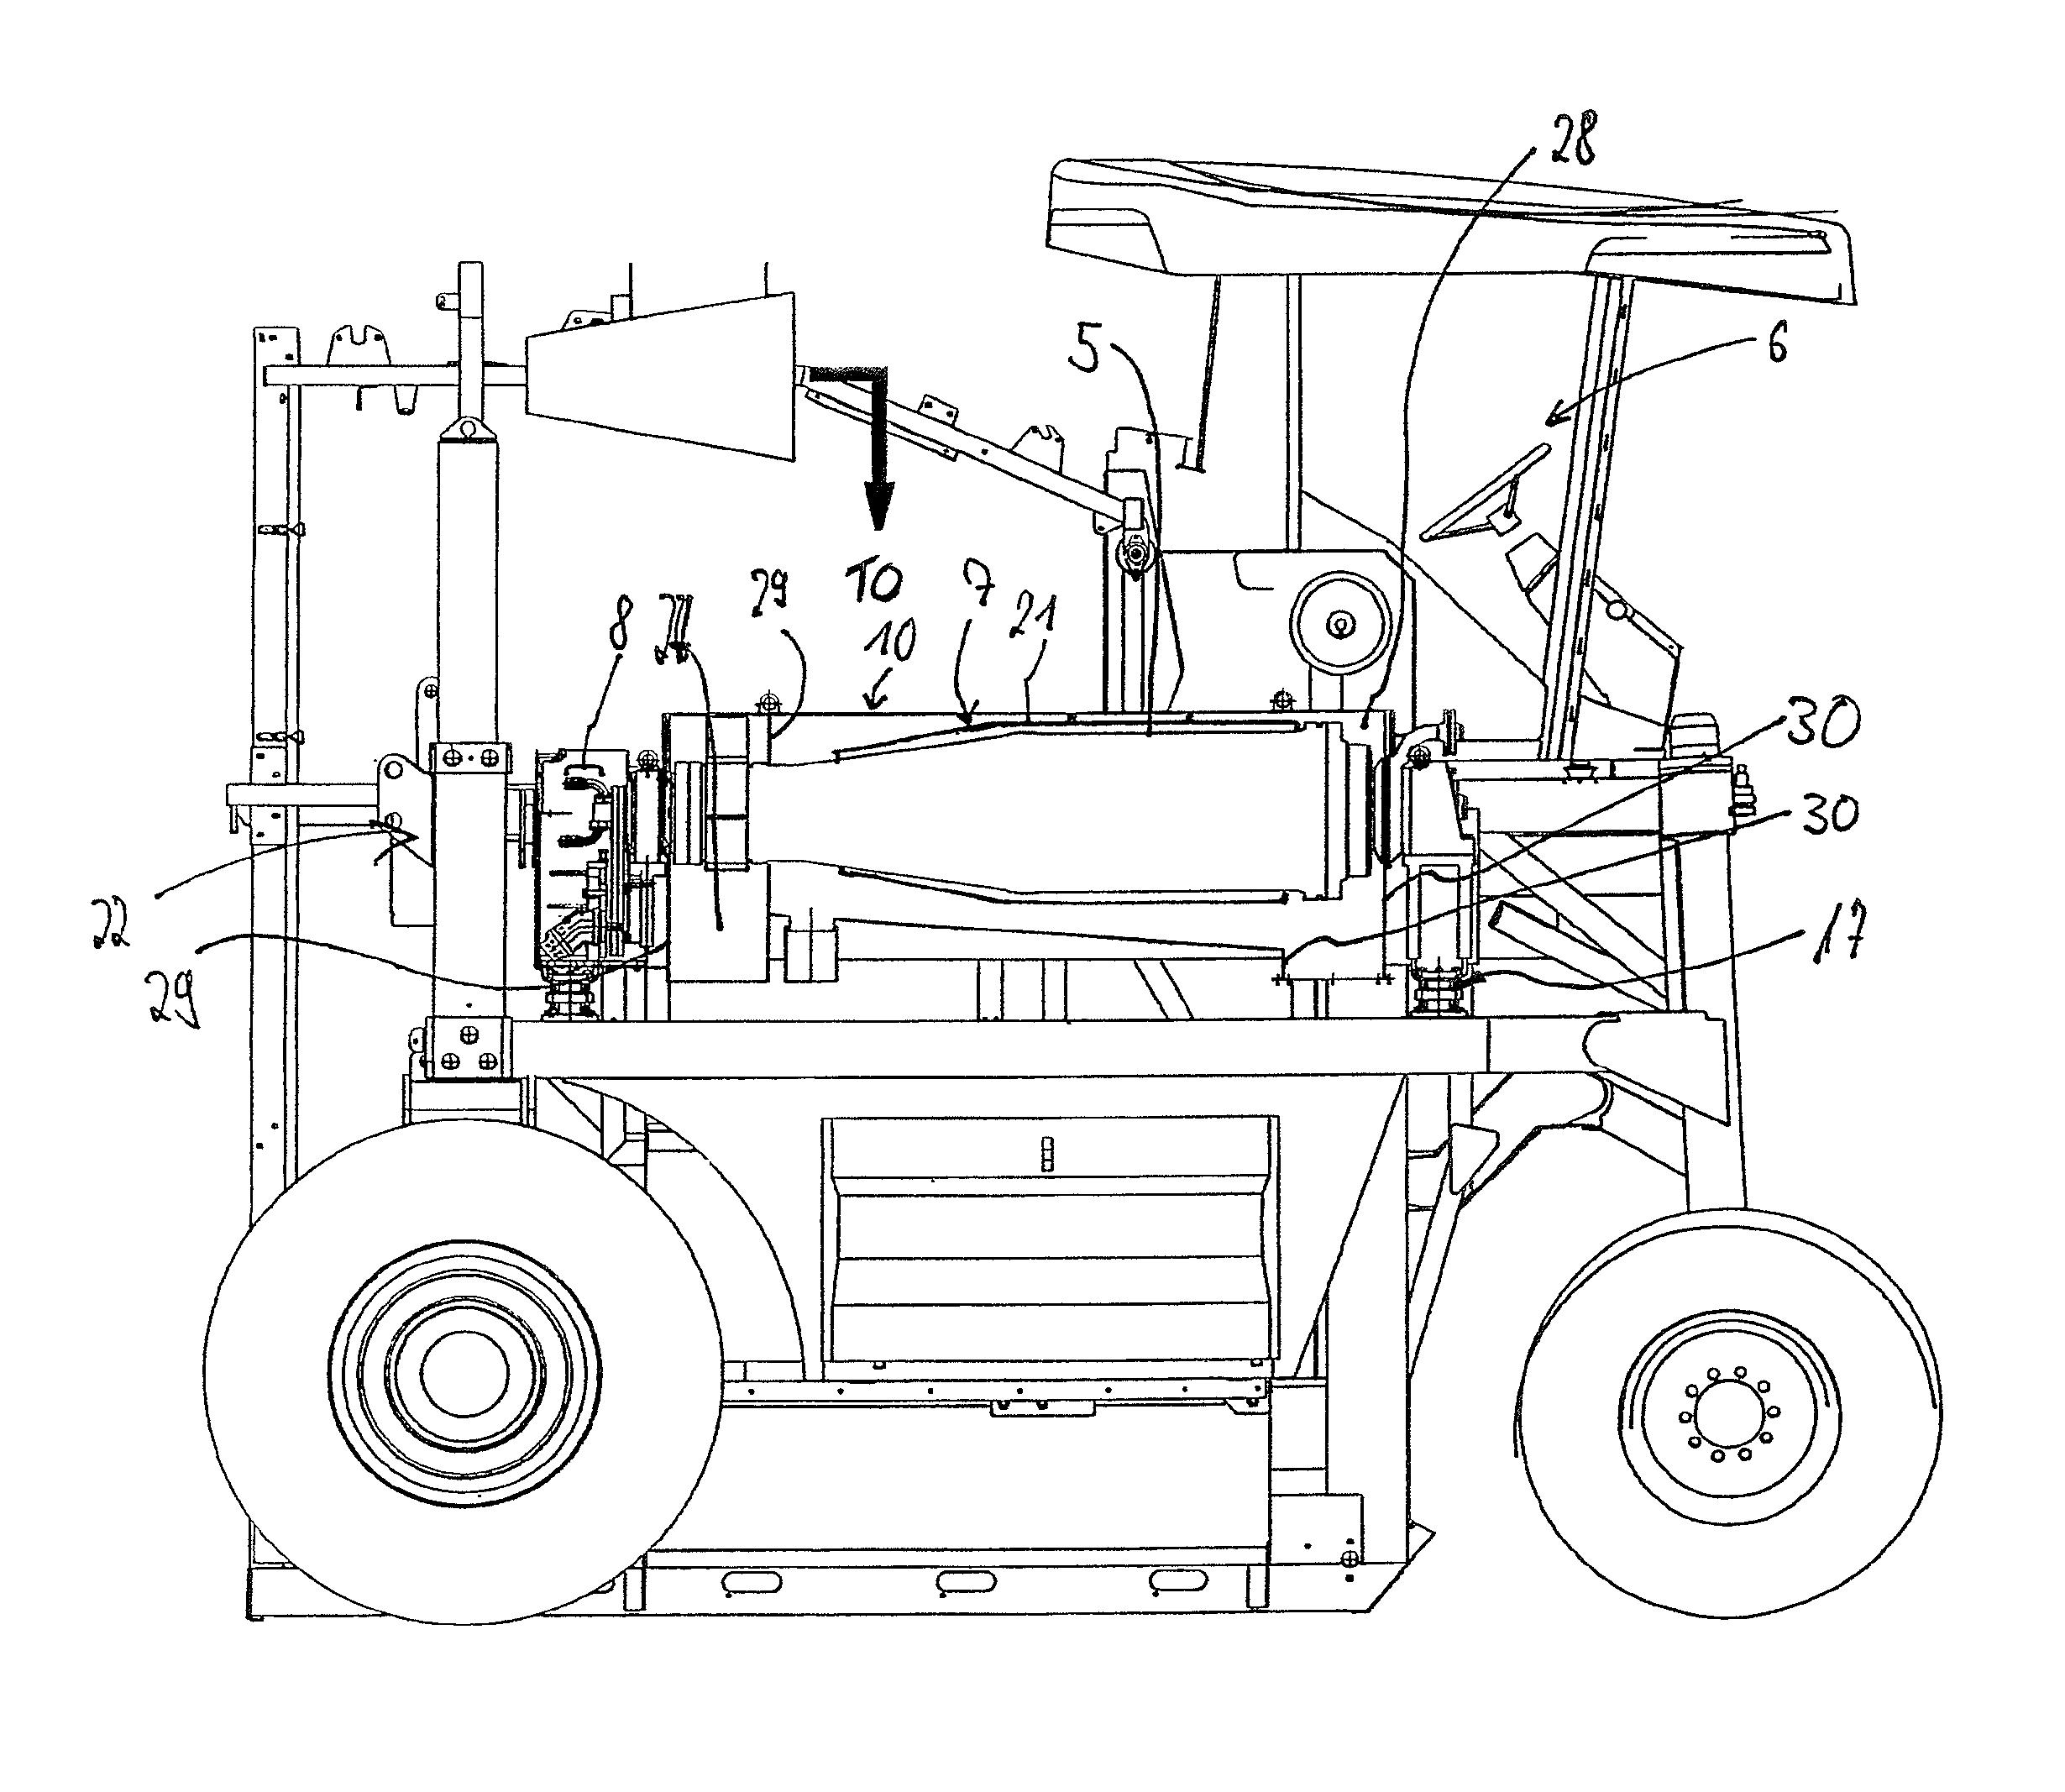 3 Phase Horizontal Separator Diagram, 3, Free Engine Image